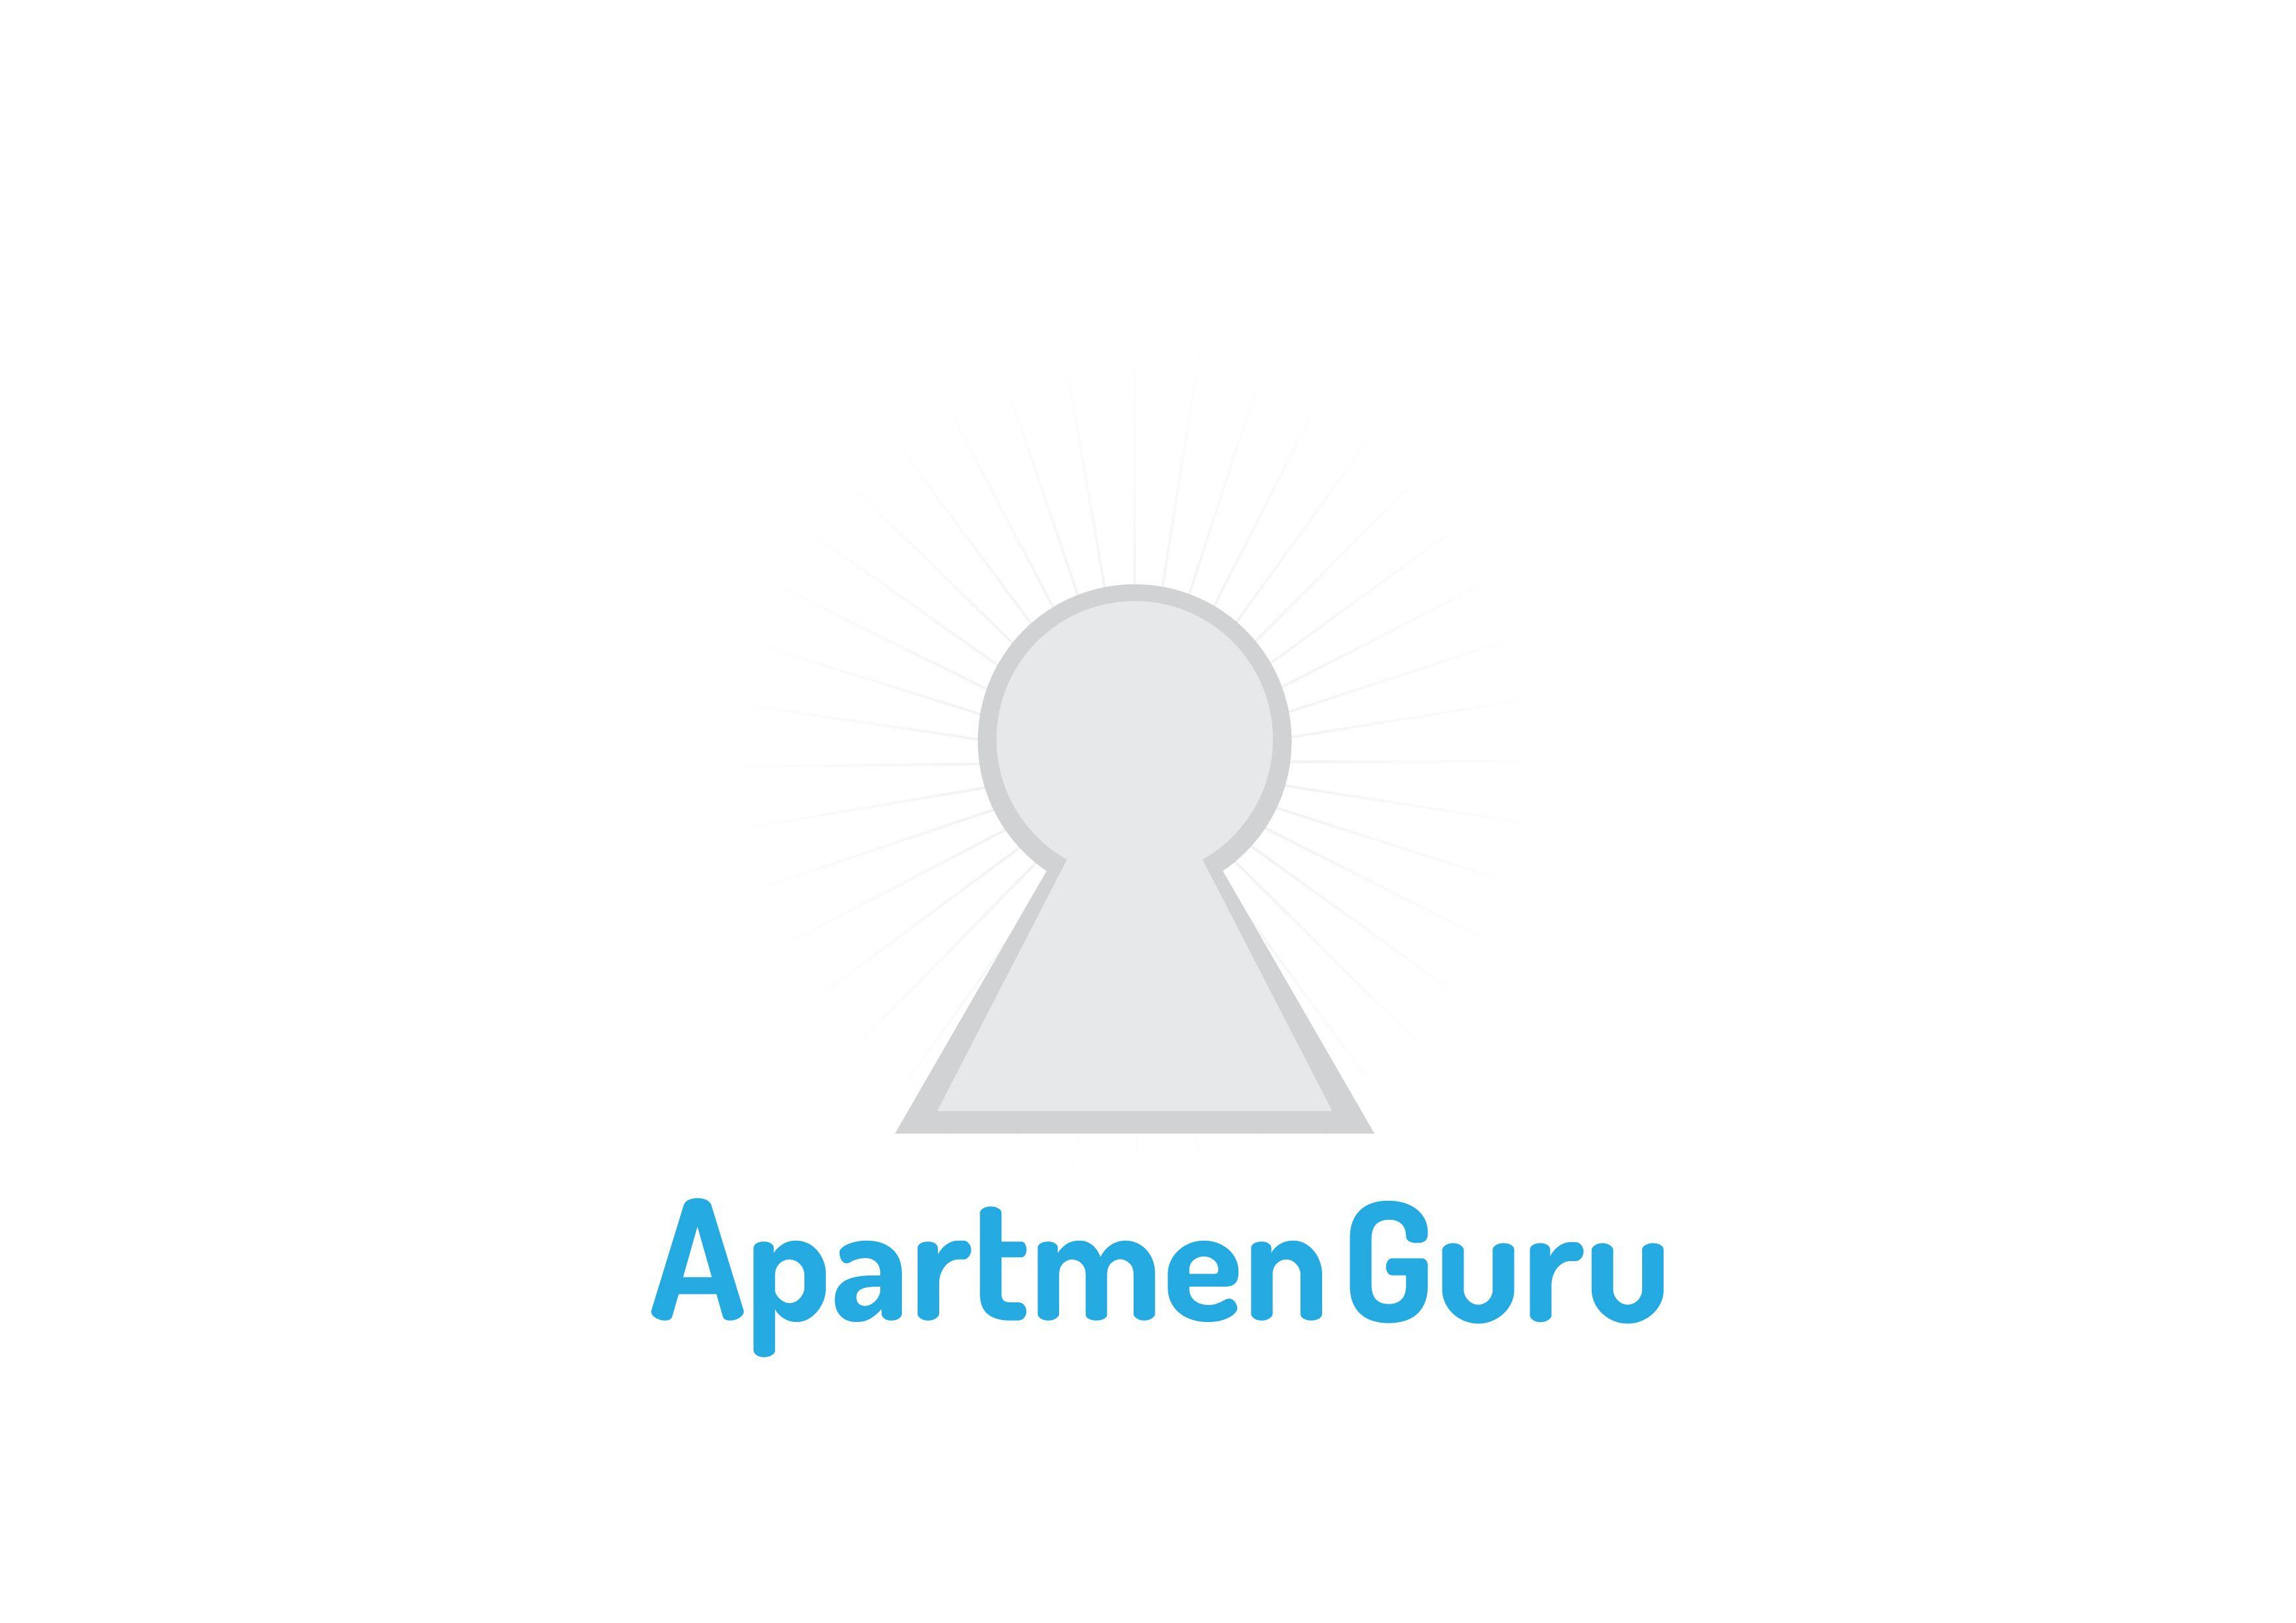 Дизайн логотипа сайта apartment guru - дизайнер MRserjo